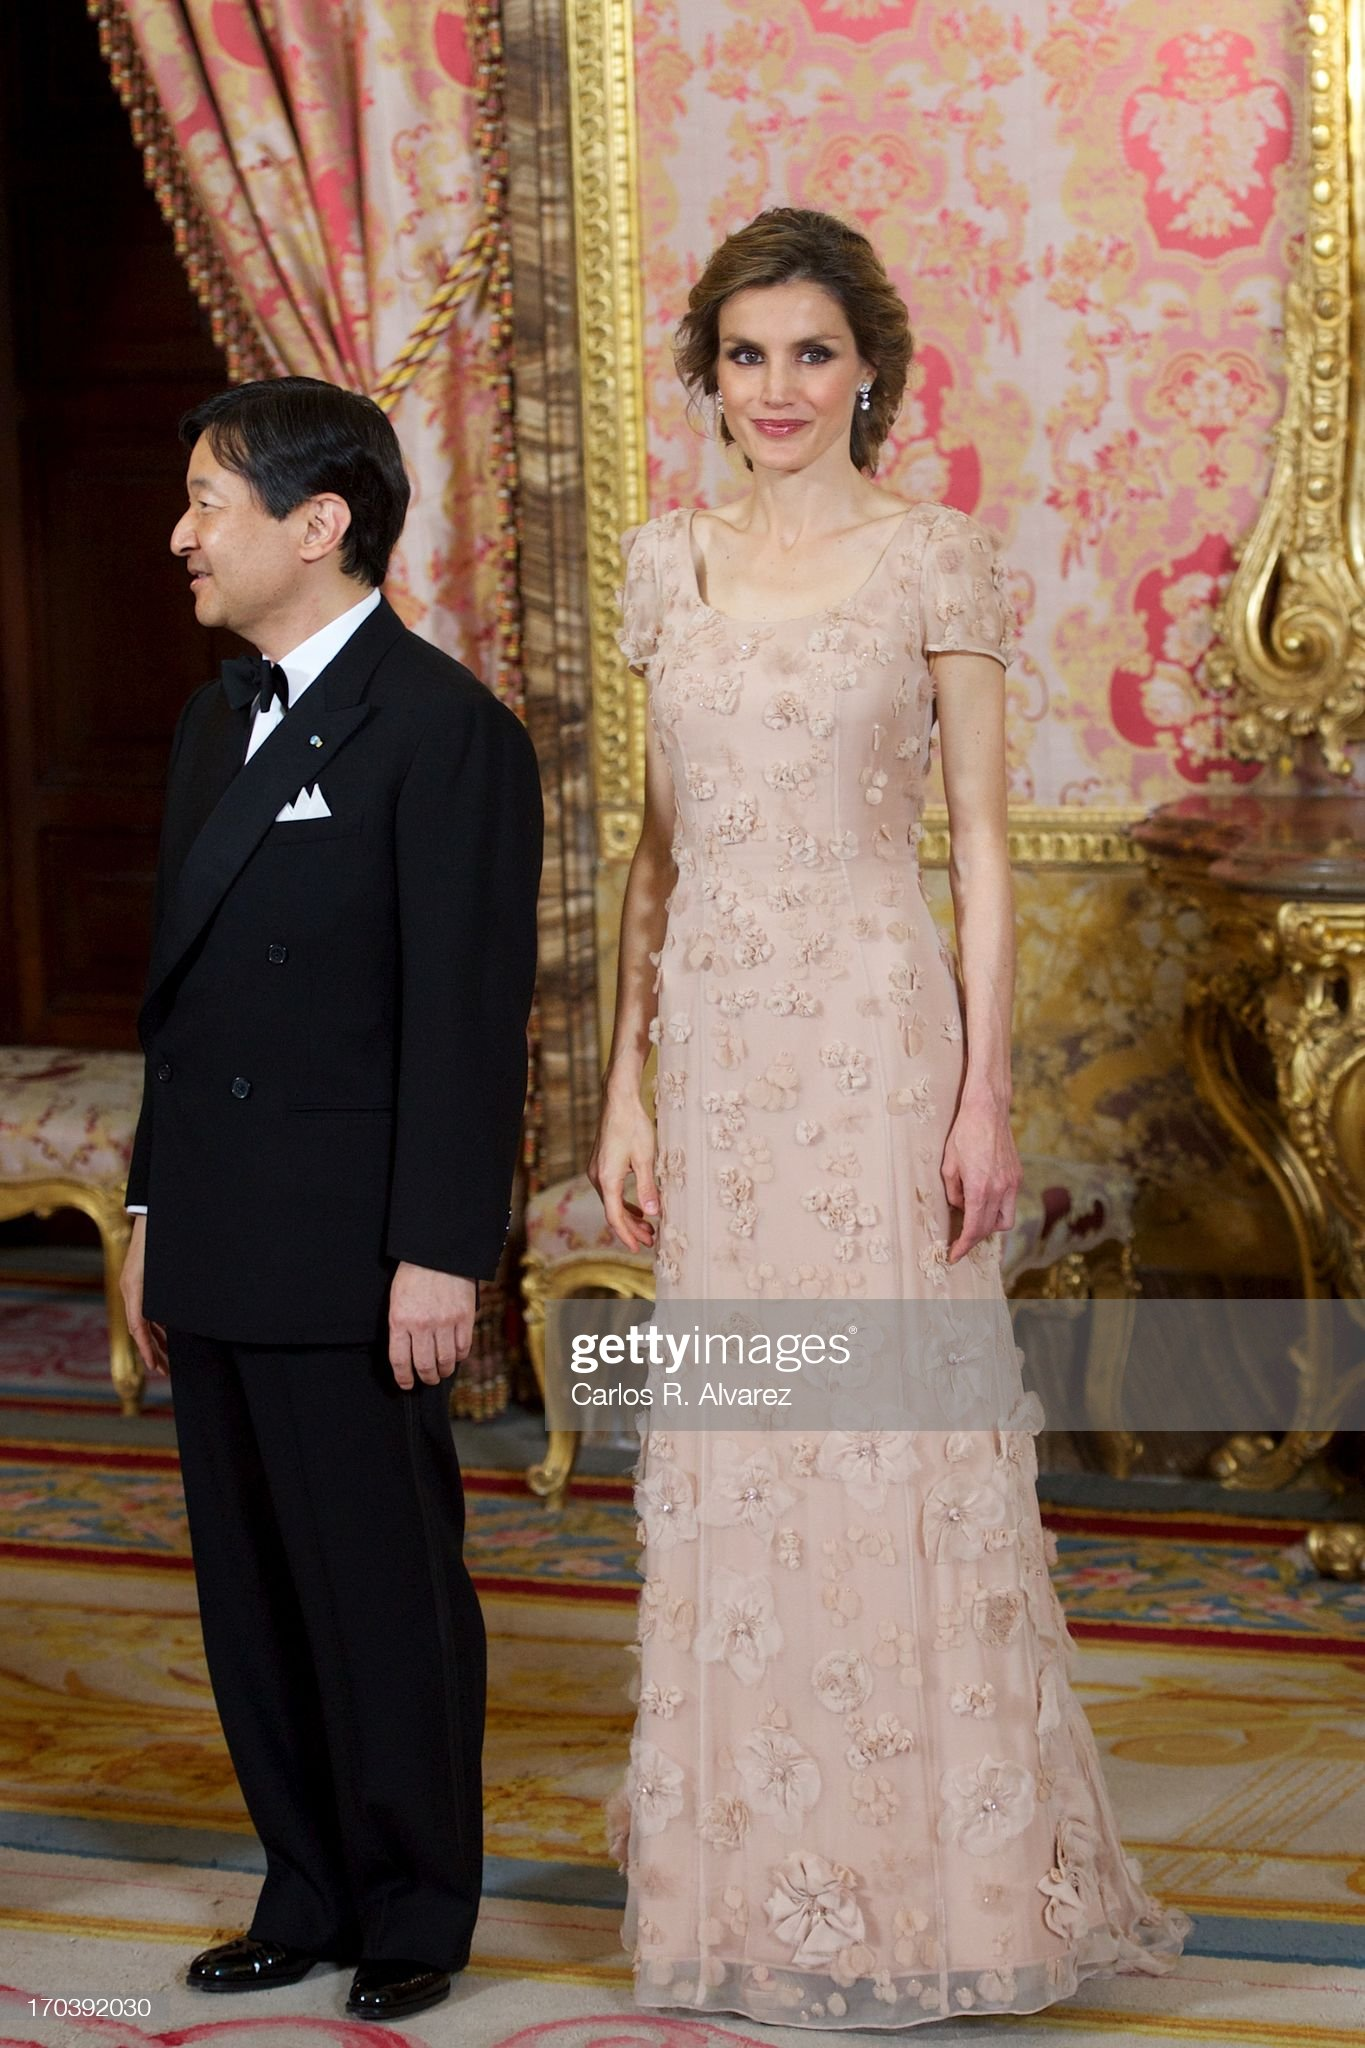 Вечерние наряды Королевы Летиции Spanish Royals and Japanese Crown Prince Naruhito Attend Dinner Gala : News Photo